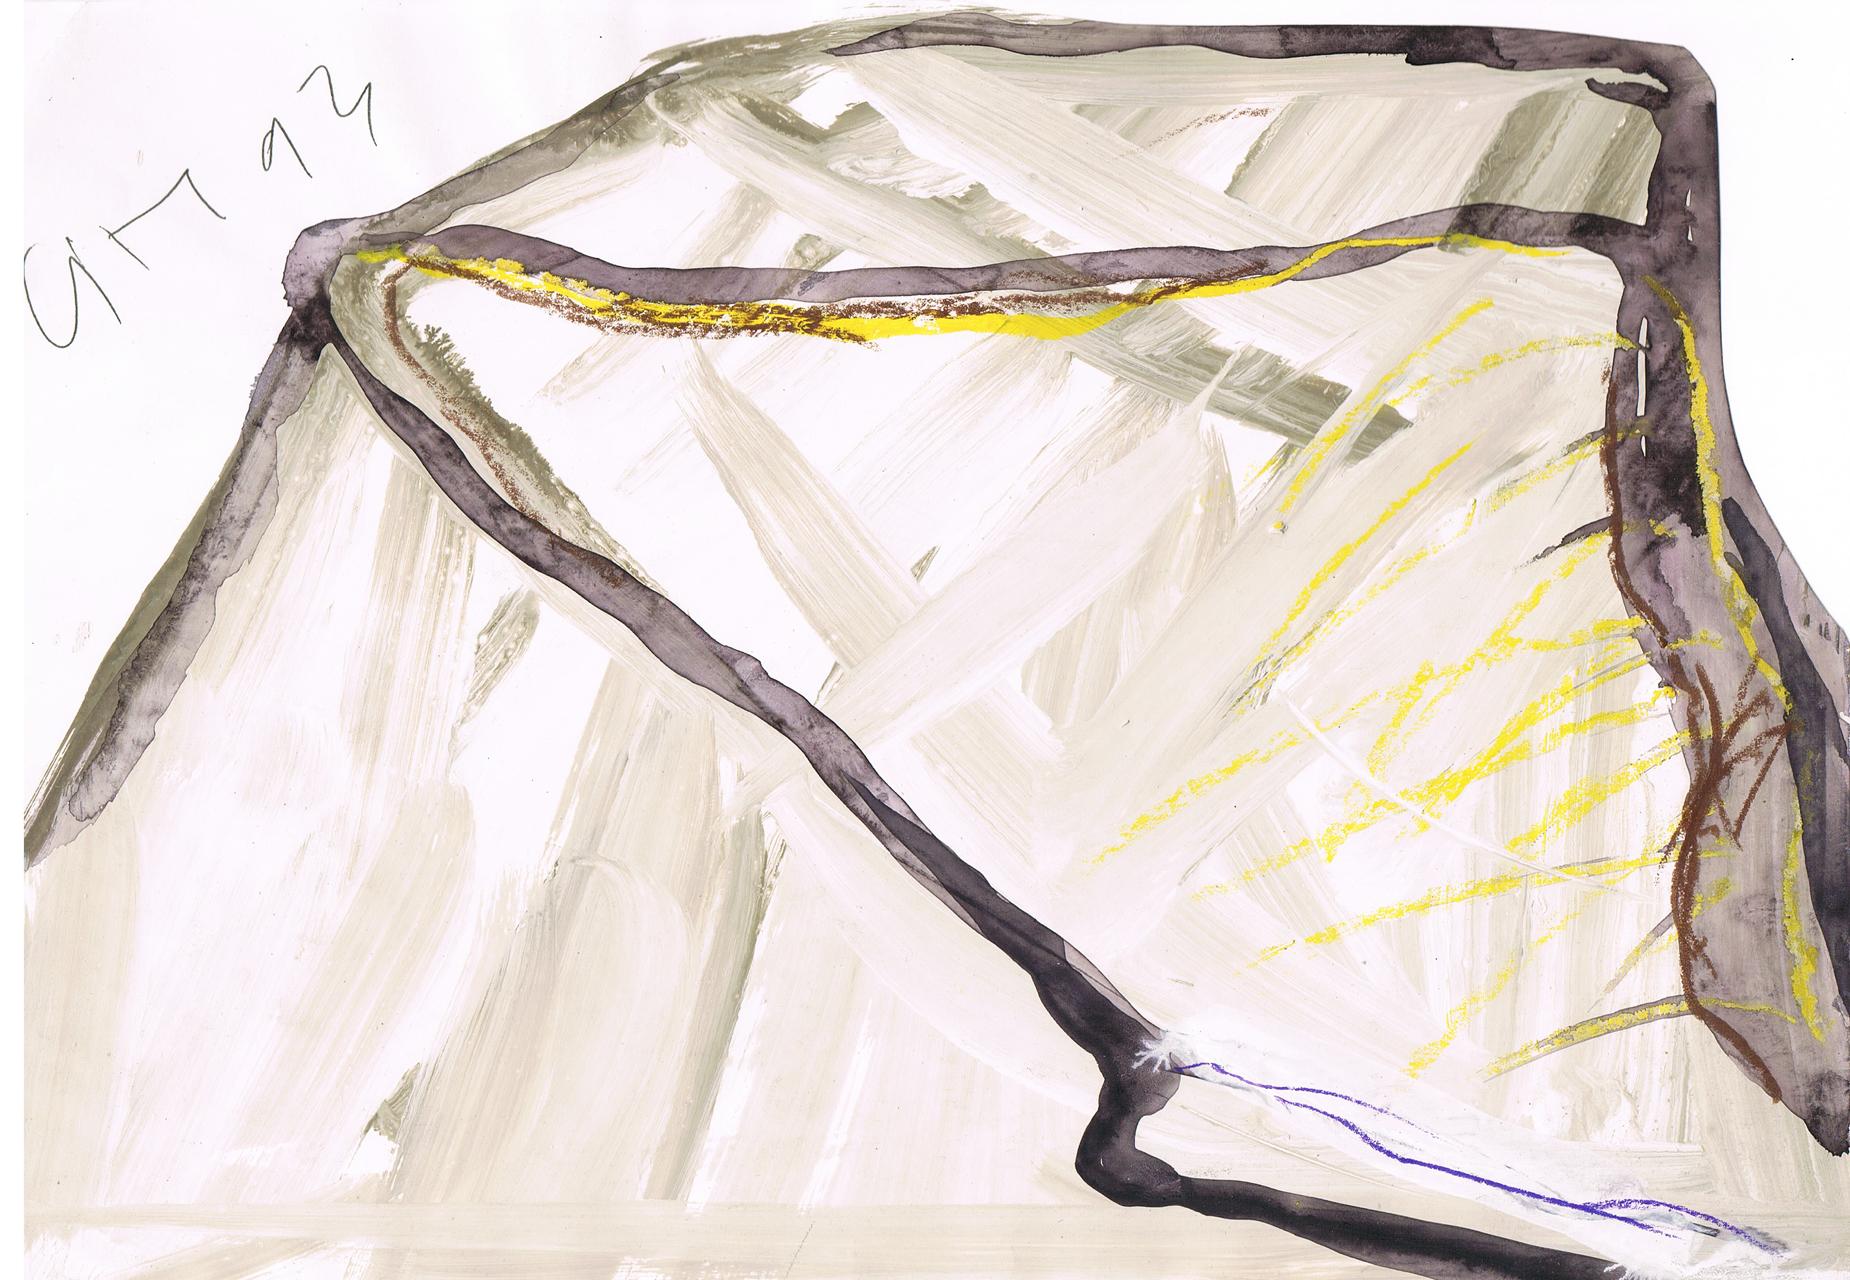 Emil Cimiotti, Ohne Titel, 1993, Collage, Gouache, Tusche auf Papier, 21 x 29,8 cm